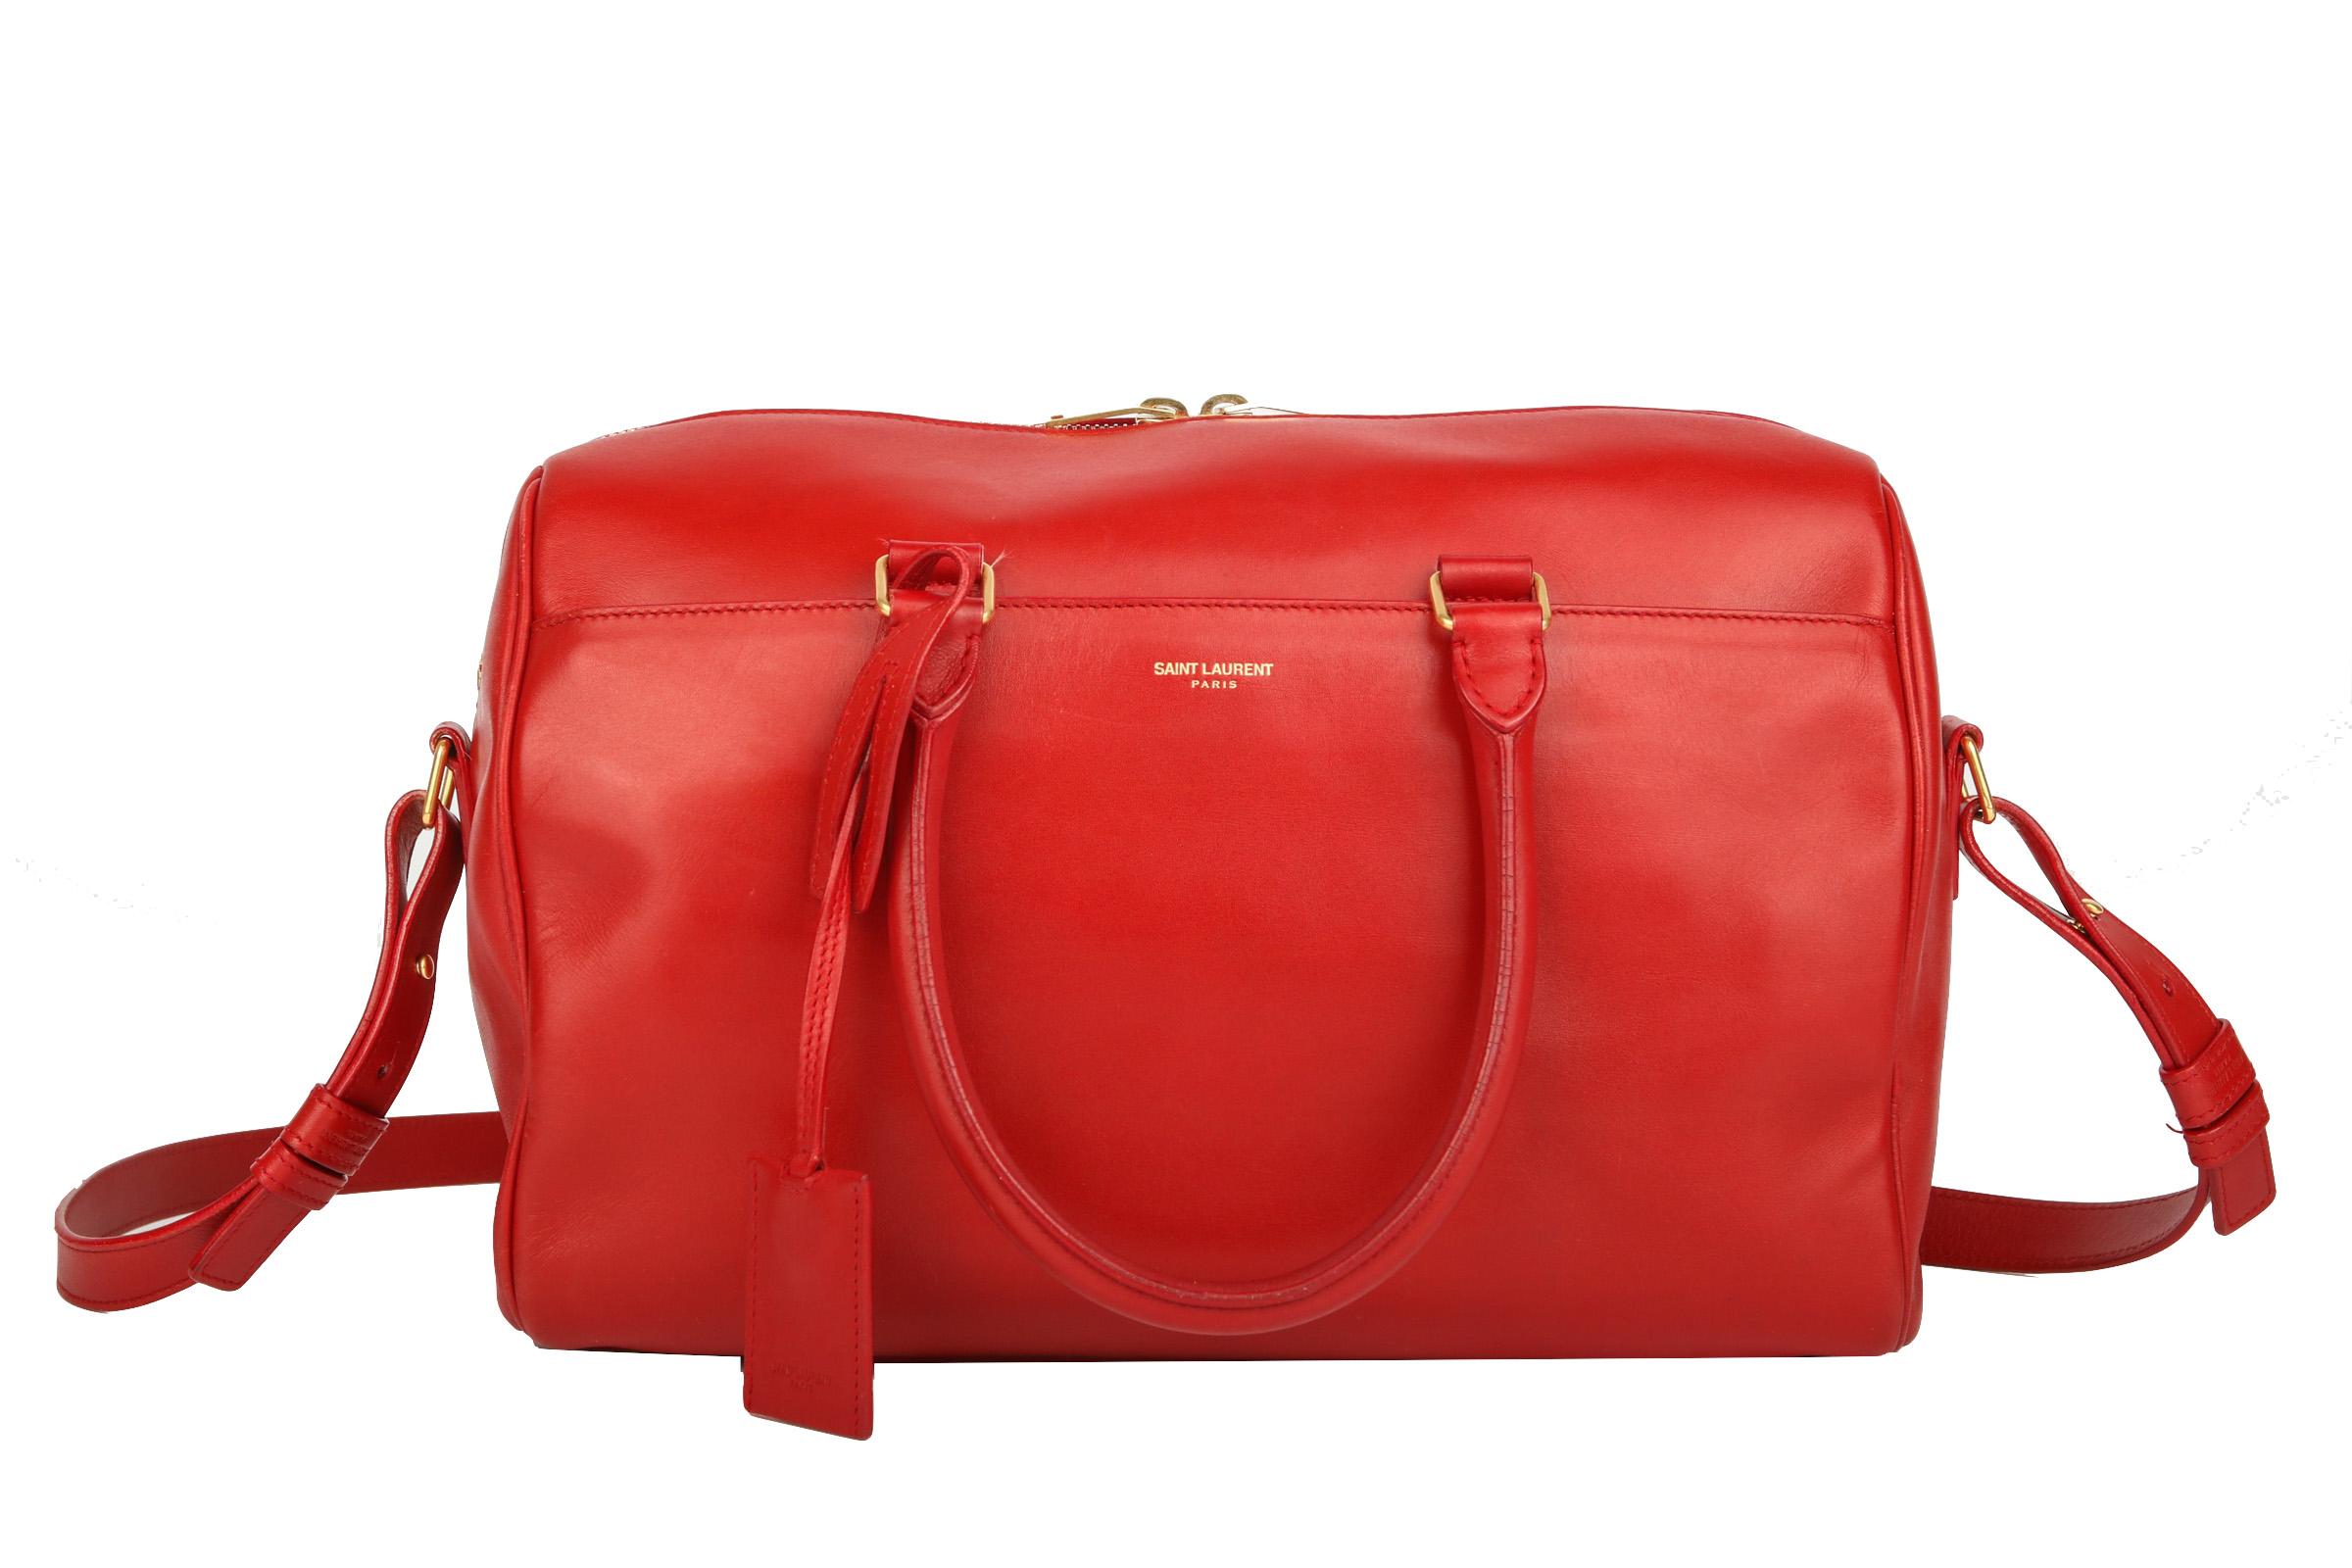 8dd4dfc0e6198 Saint Laurent Duffle 3 Mini Bowling Bag Rot